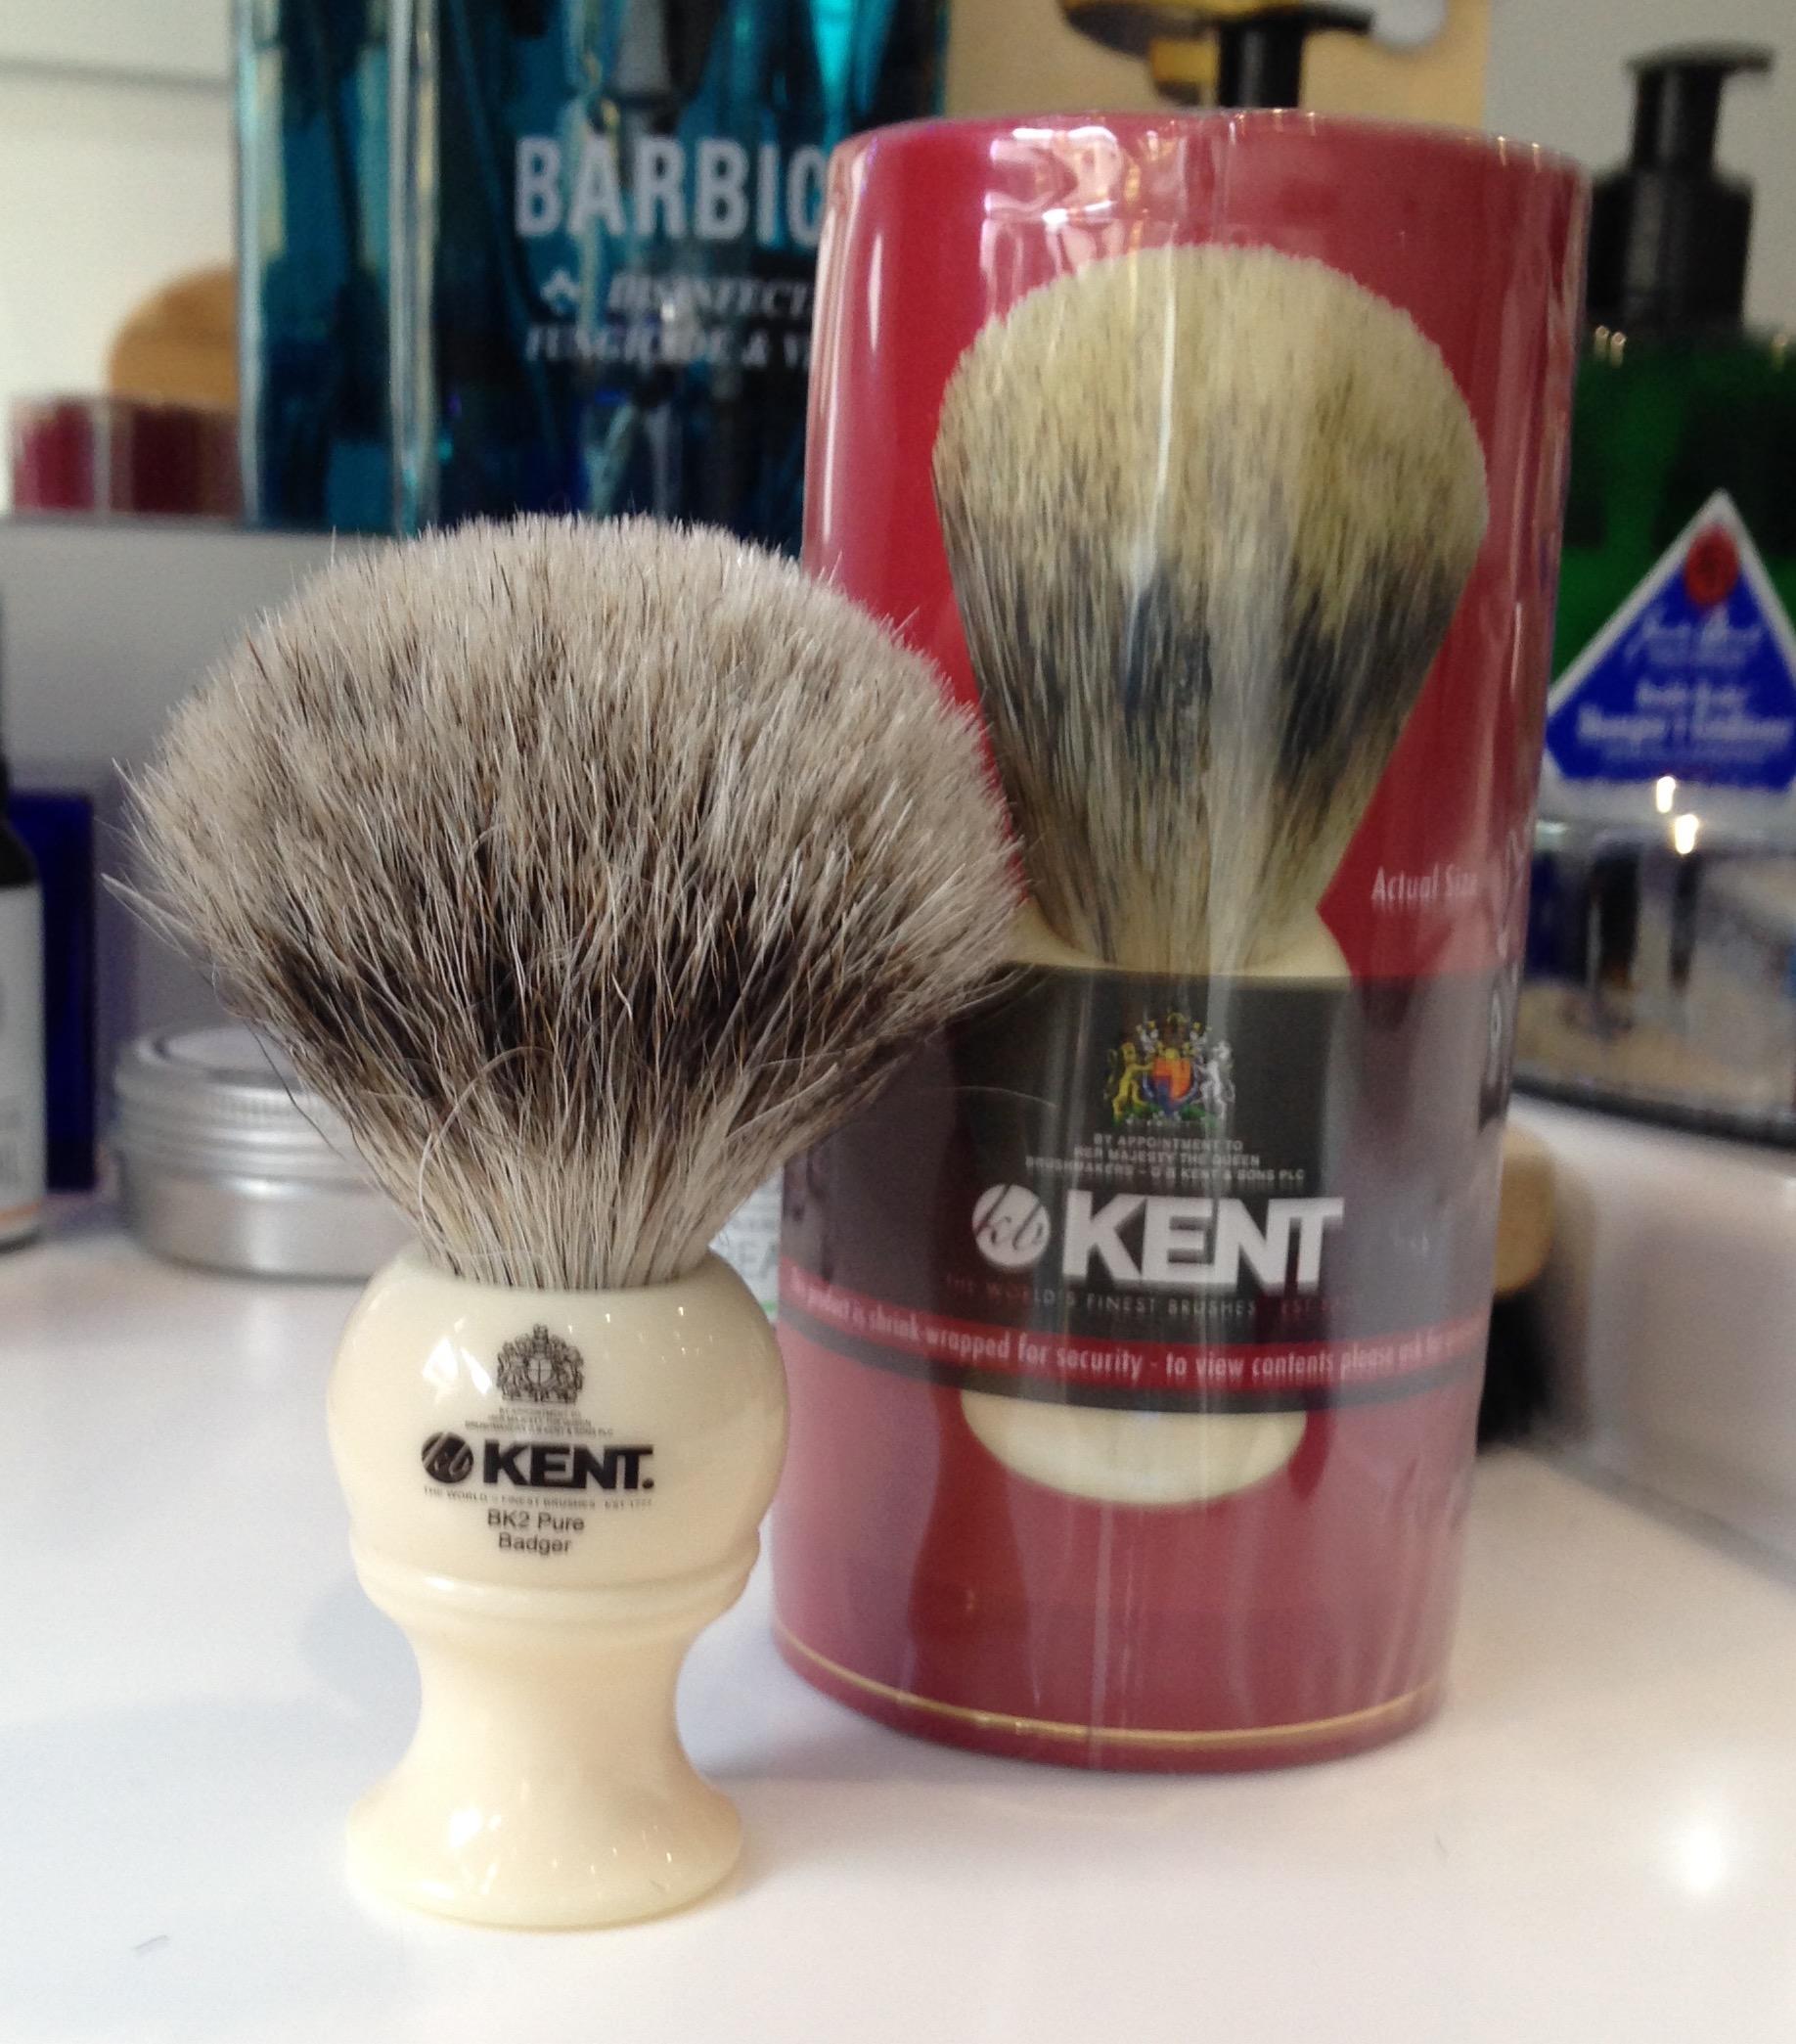 KentTraditional medium sized, pure grey badger brush.